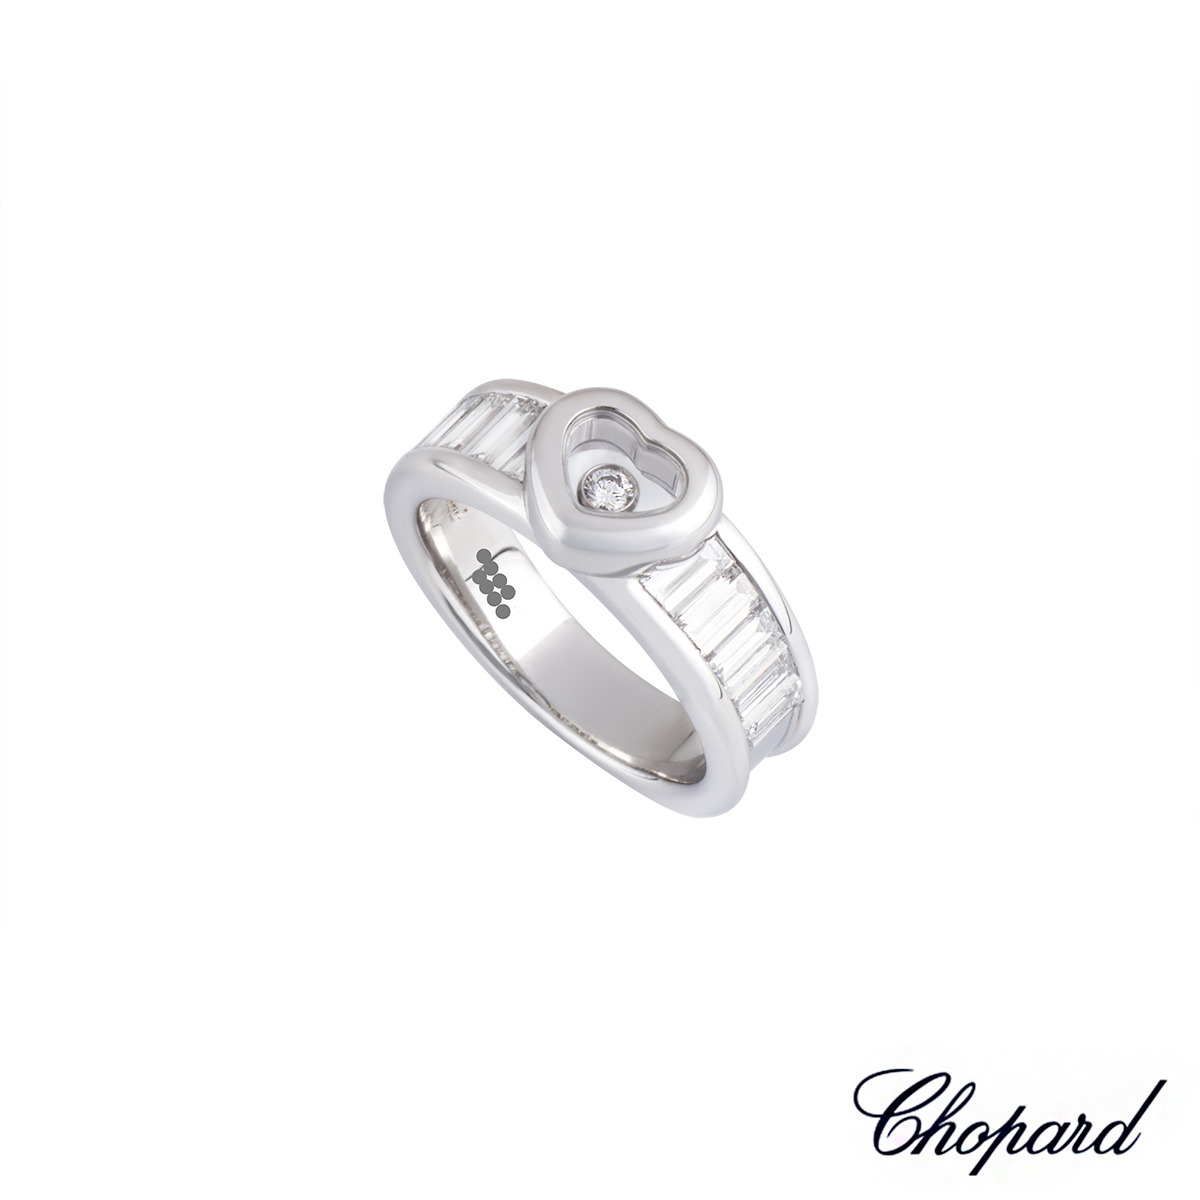 Chopard 18k White Gold Happy Diamonds Heart Ring B&P 82/2853-001